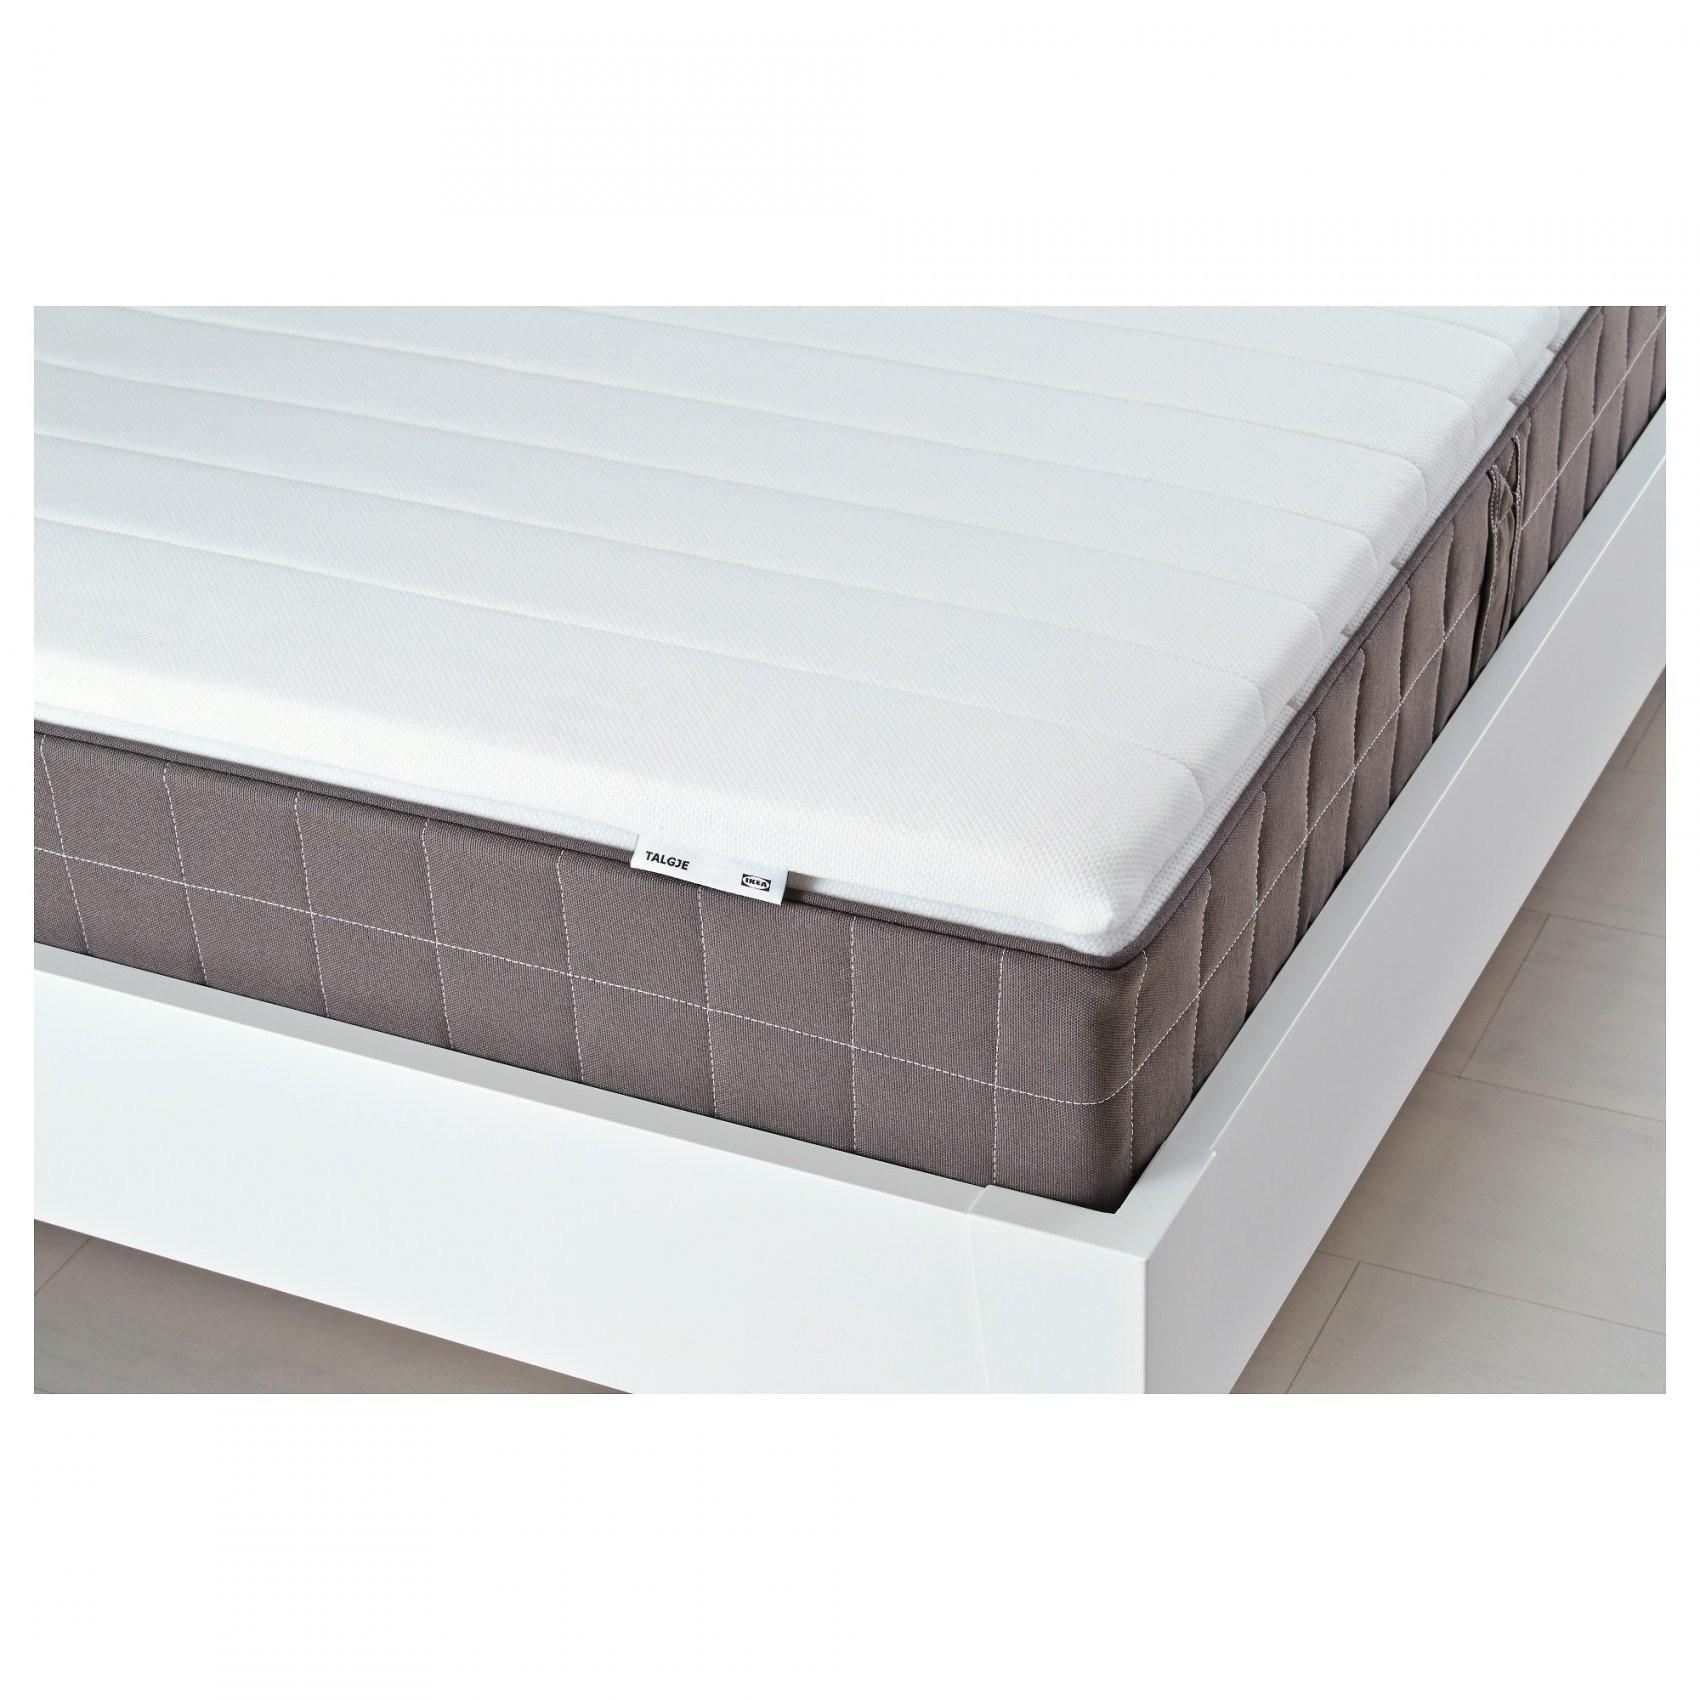 Talgje Dekmatras Wit 160 X 200 Cm  Ikea von Matratzen Topper 80X200 Bild